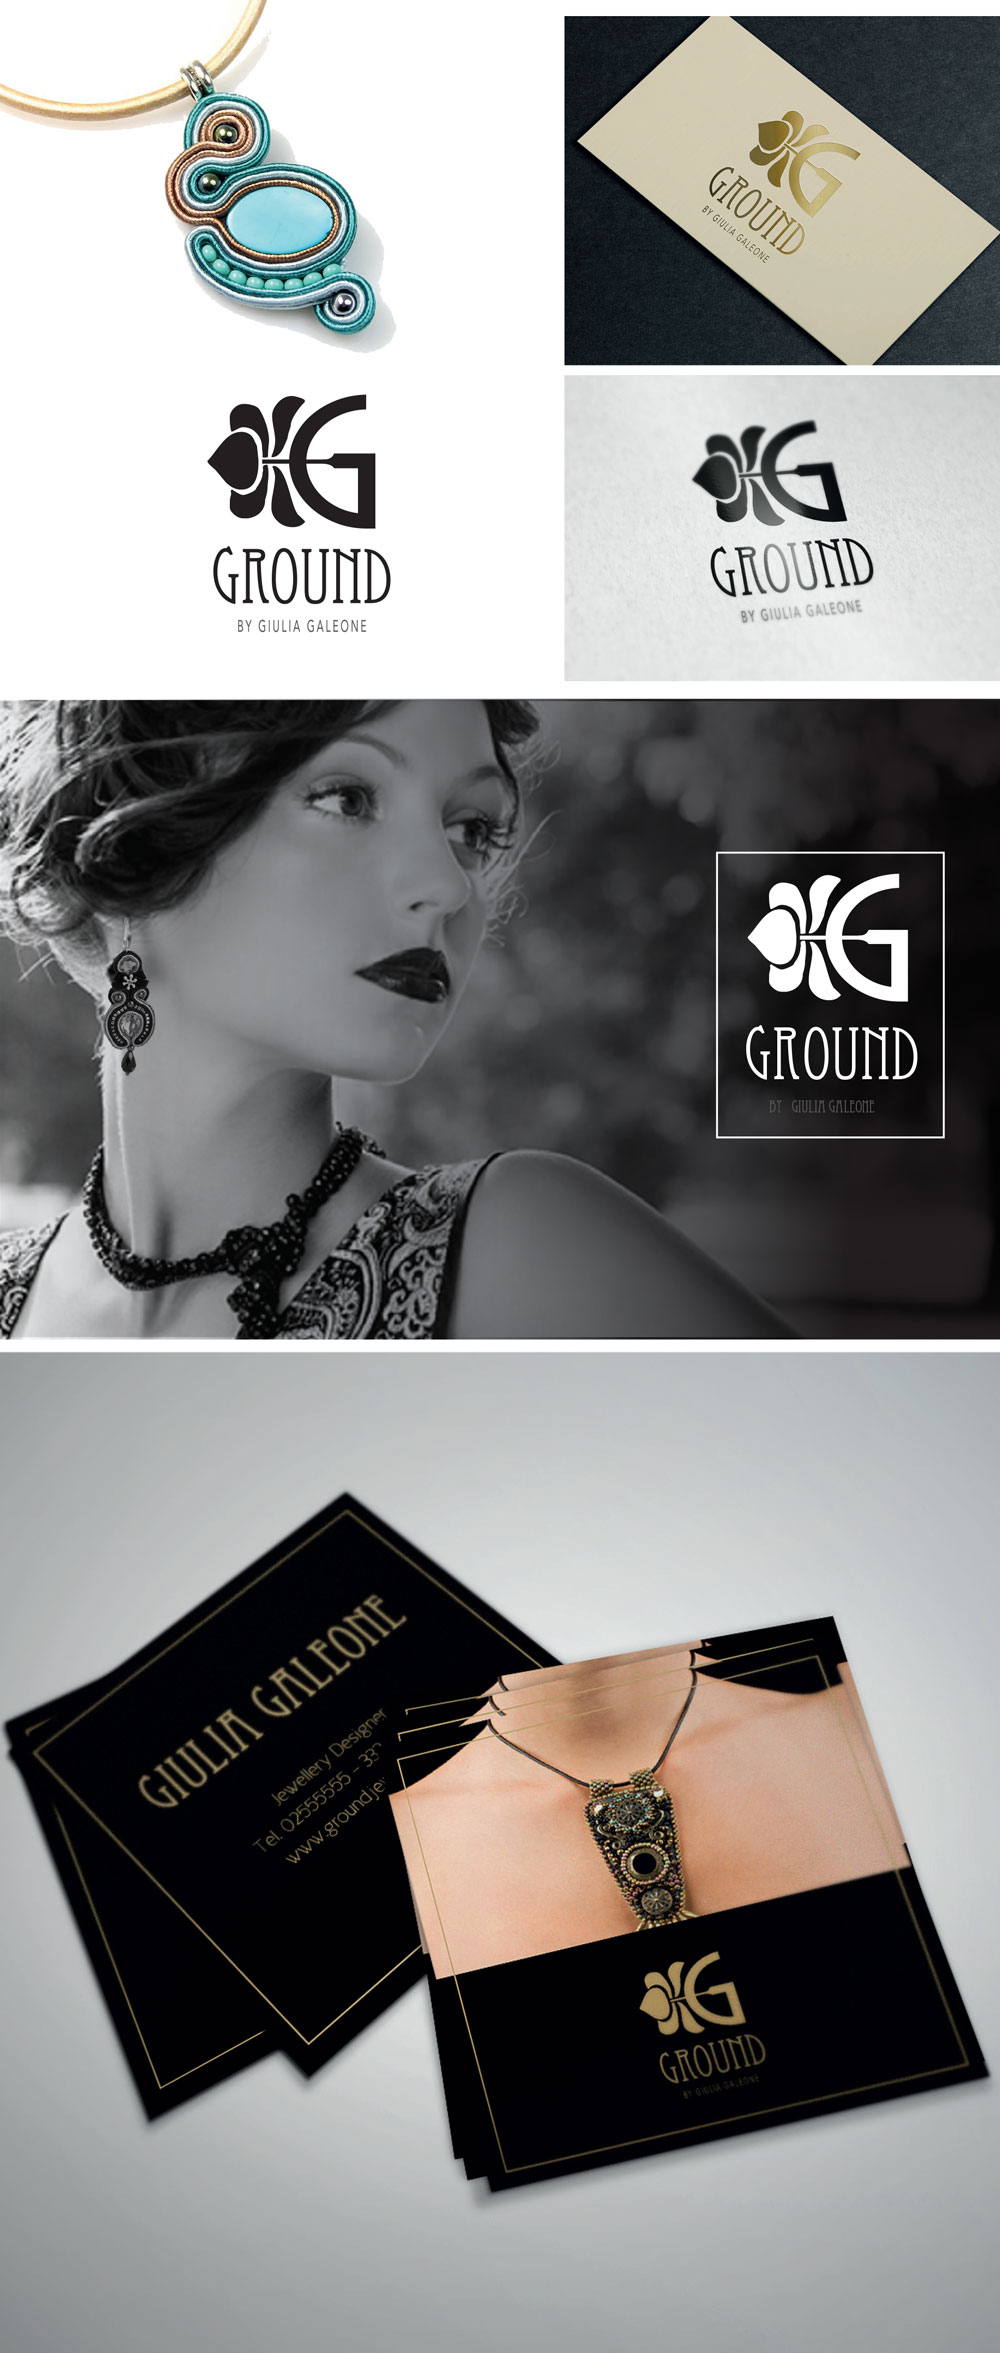 g_ground_logo_01.jpg